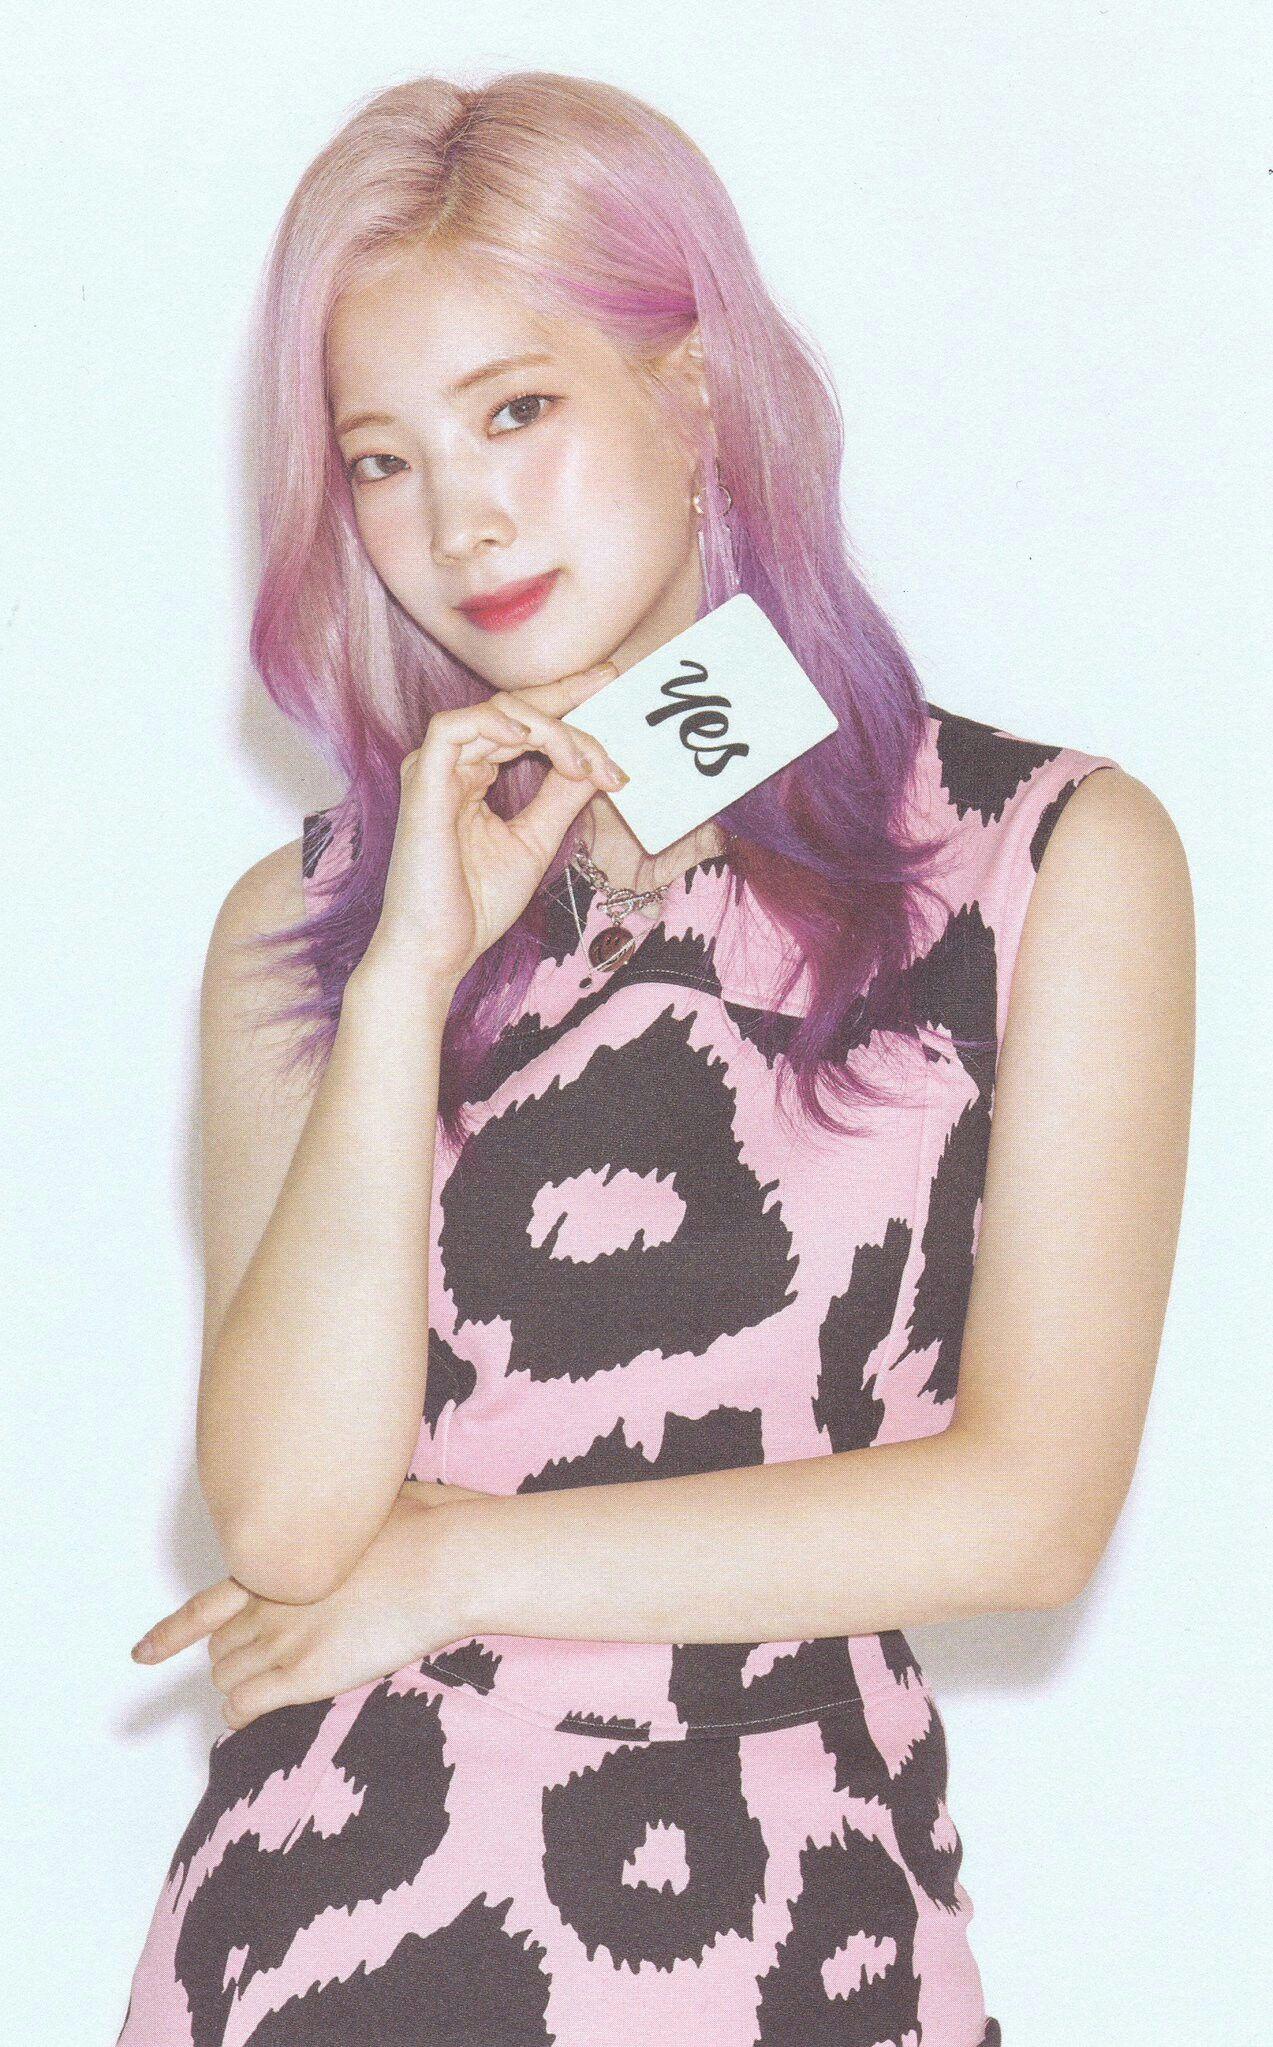 Version C Twice Dahyun Kpop Girls Twice Photoshoot